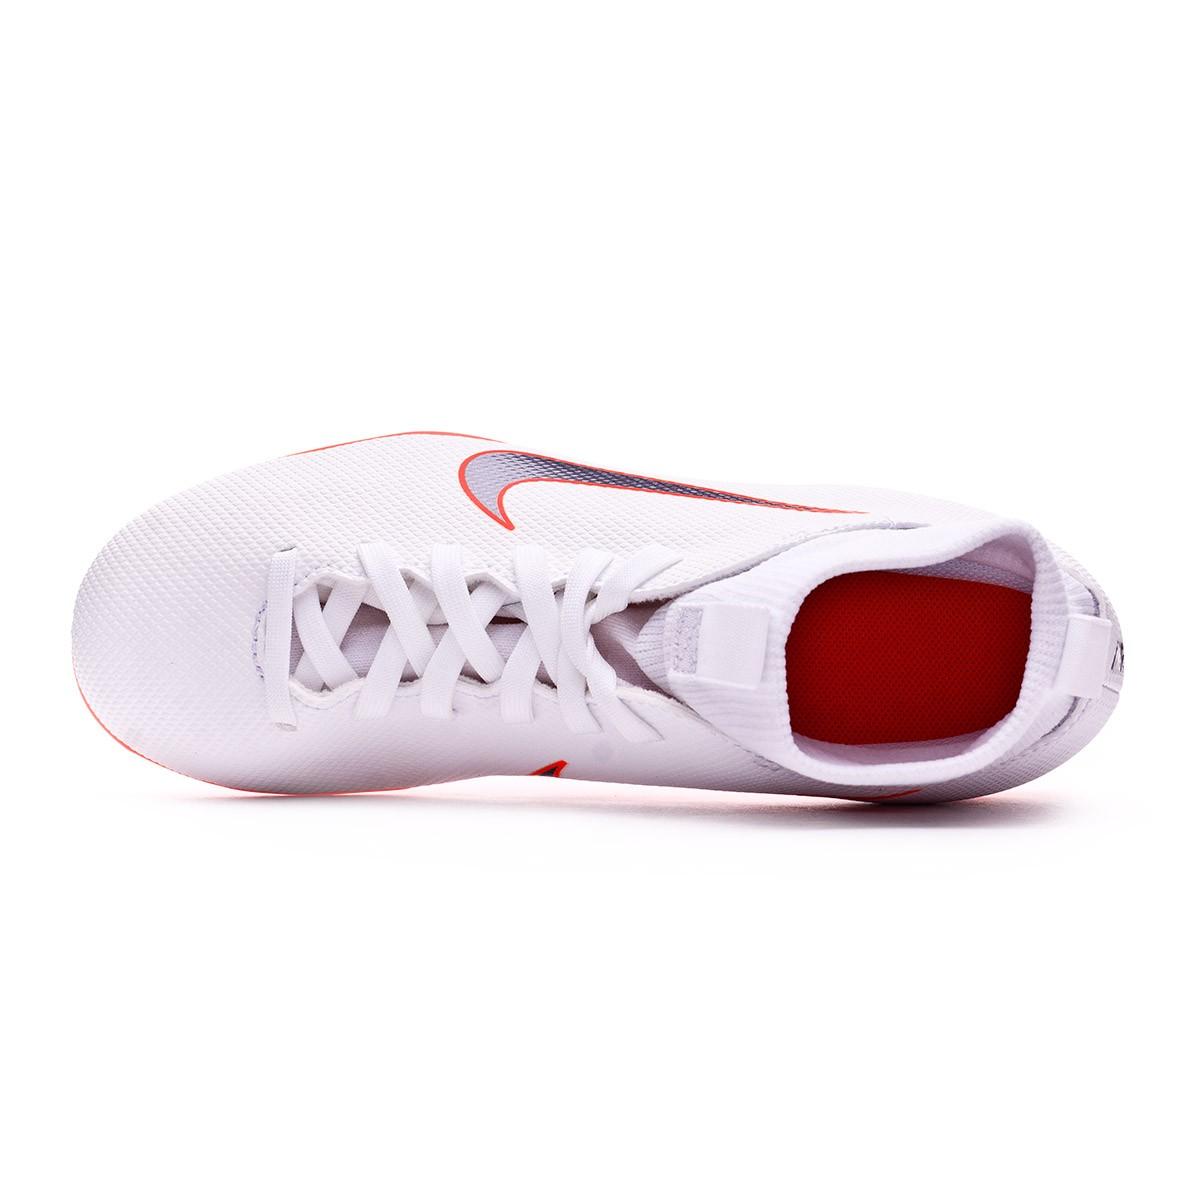 74f26e23542e Football Boots Nike Kids Mercurial Superfly VI Club MG White-Metallic cool  grey-Total orange - Tienda de fútbol Fútbol Emotion